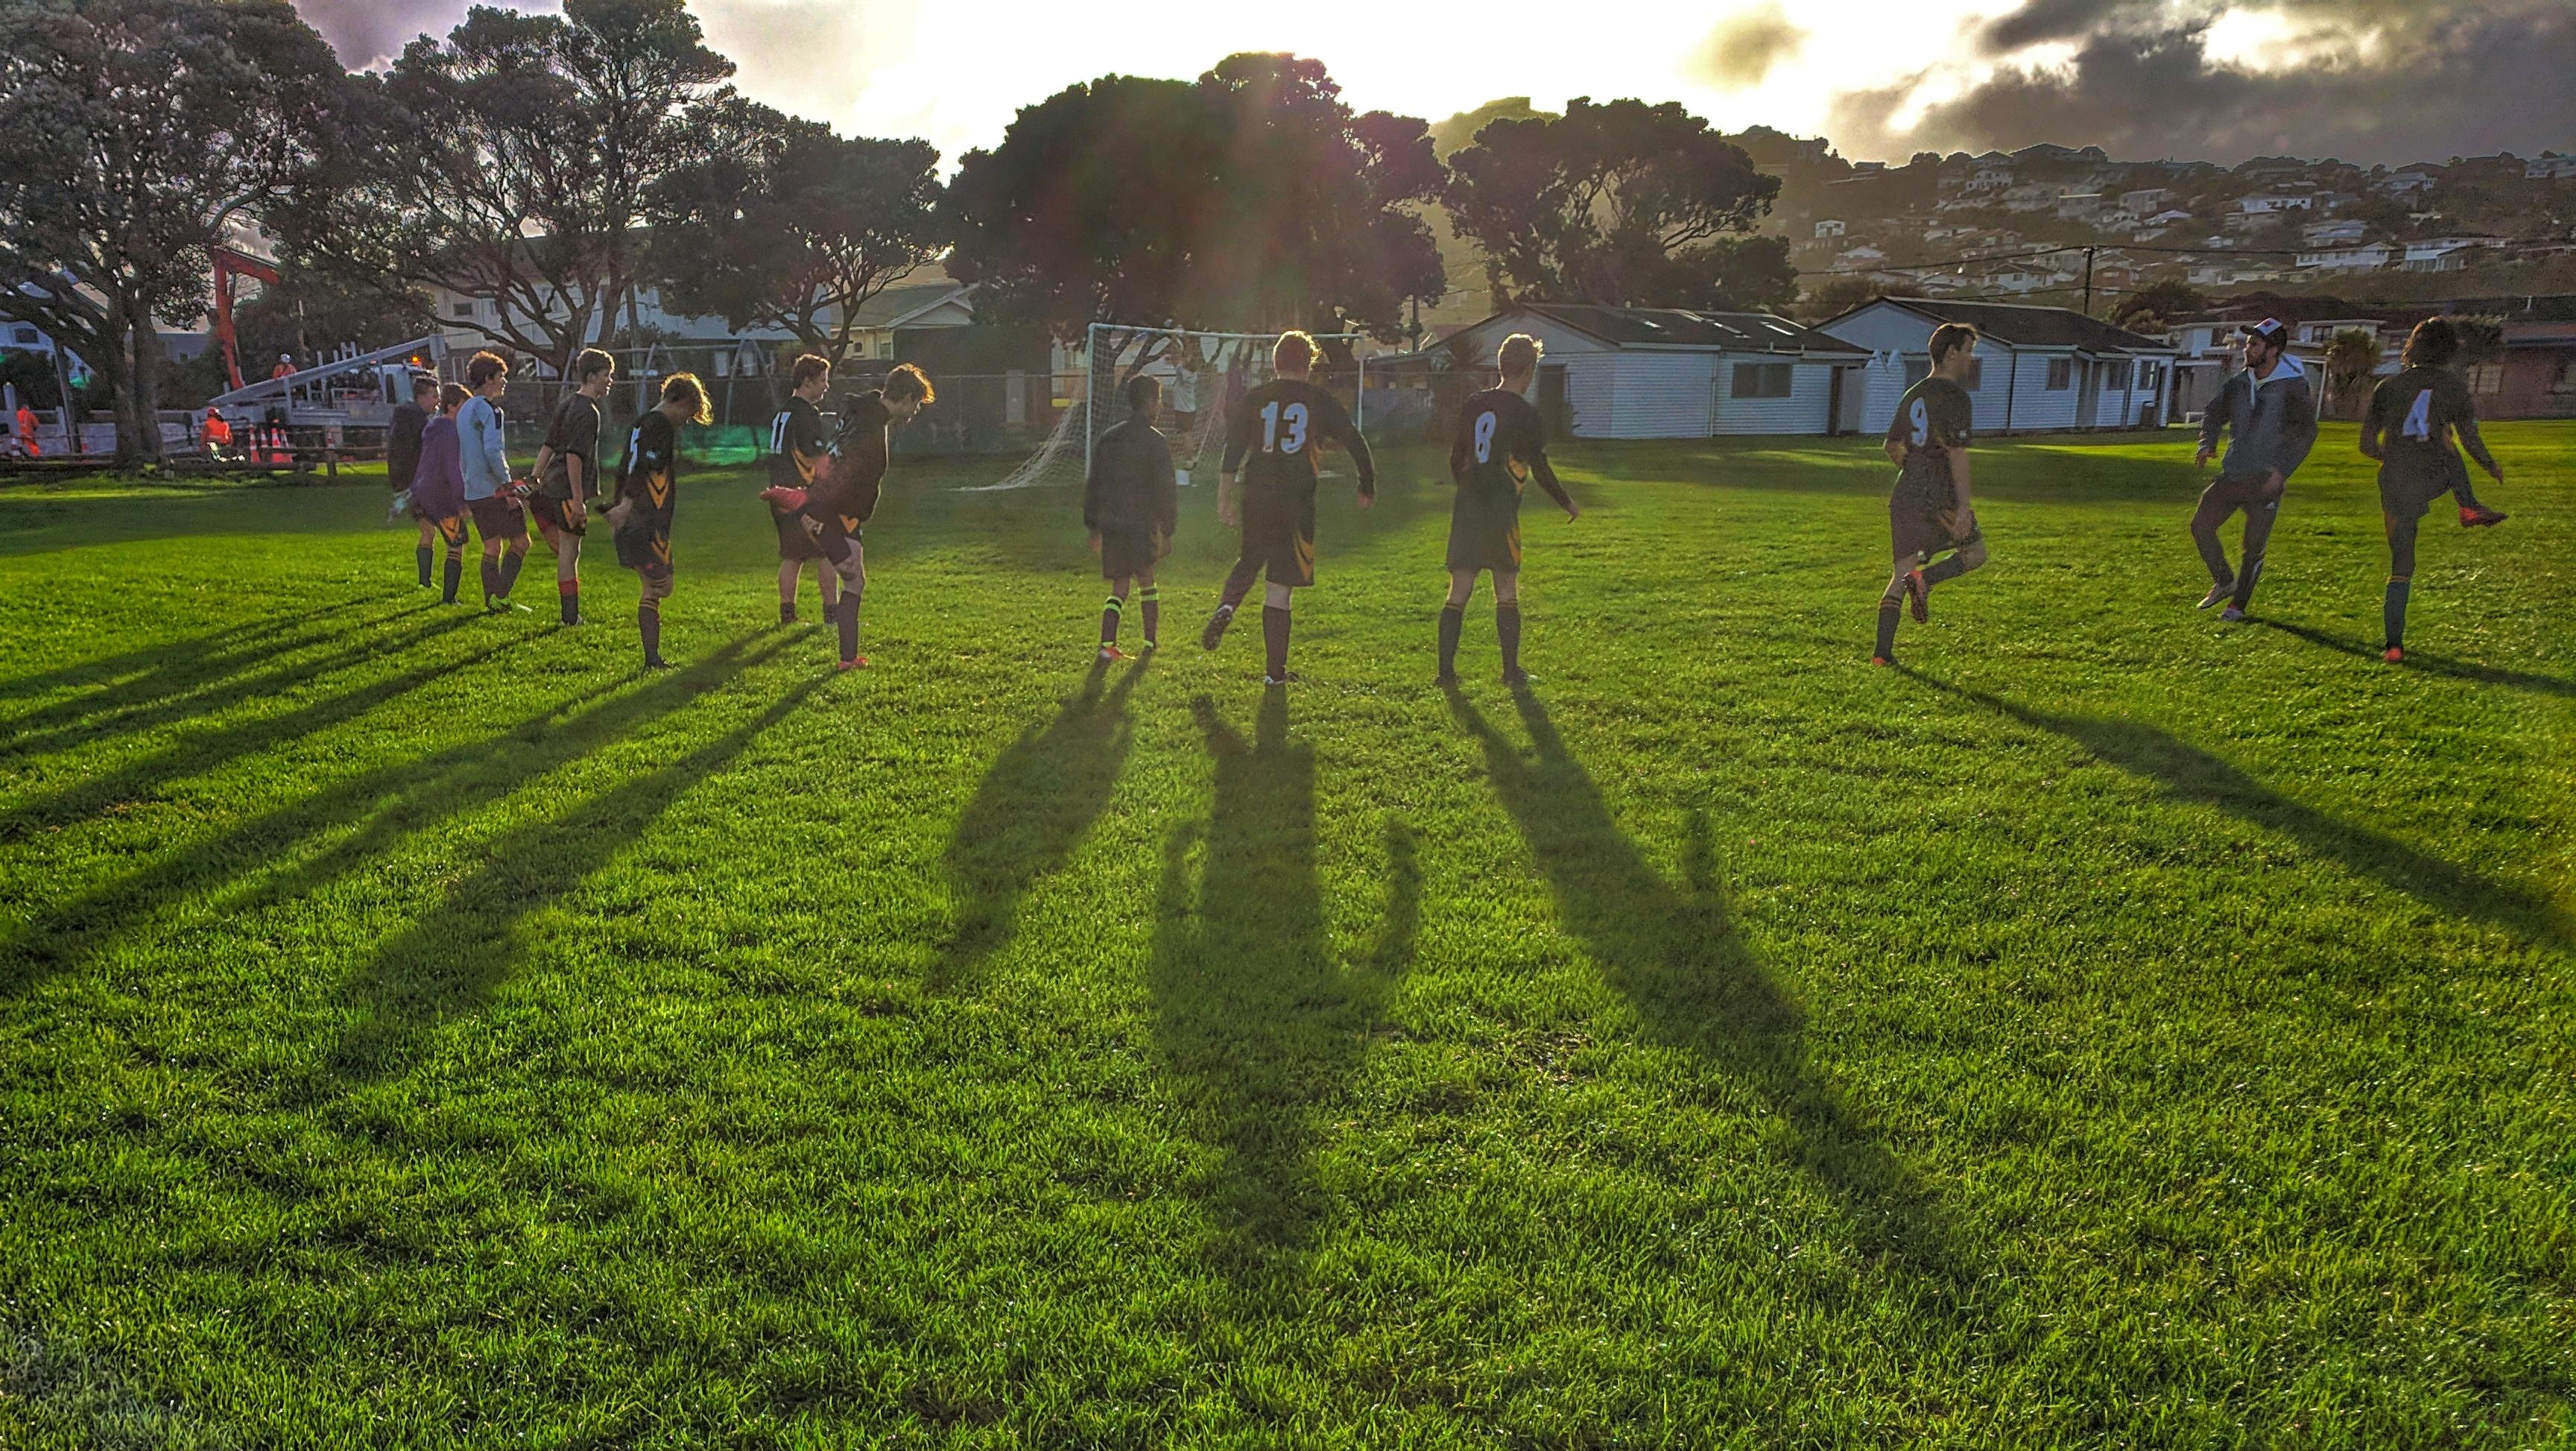 Weekend football in Miramar